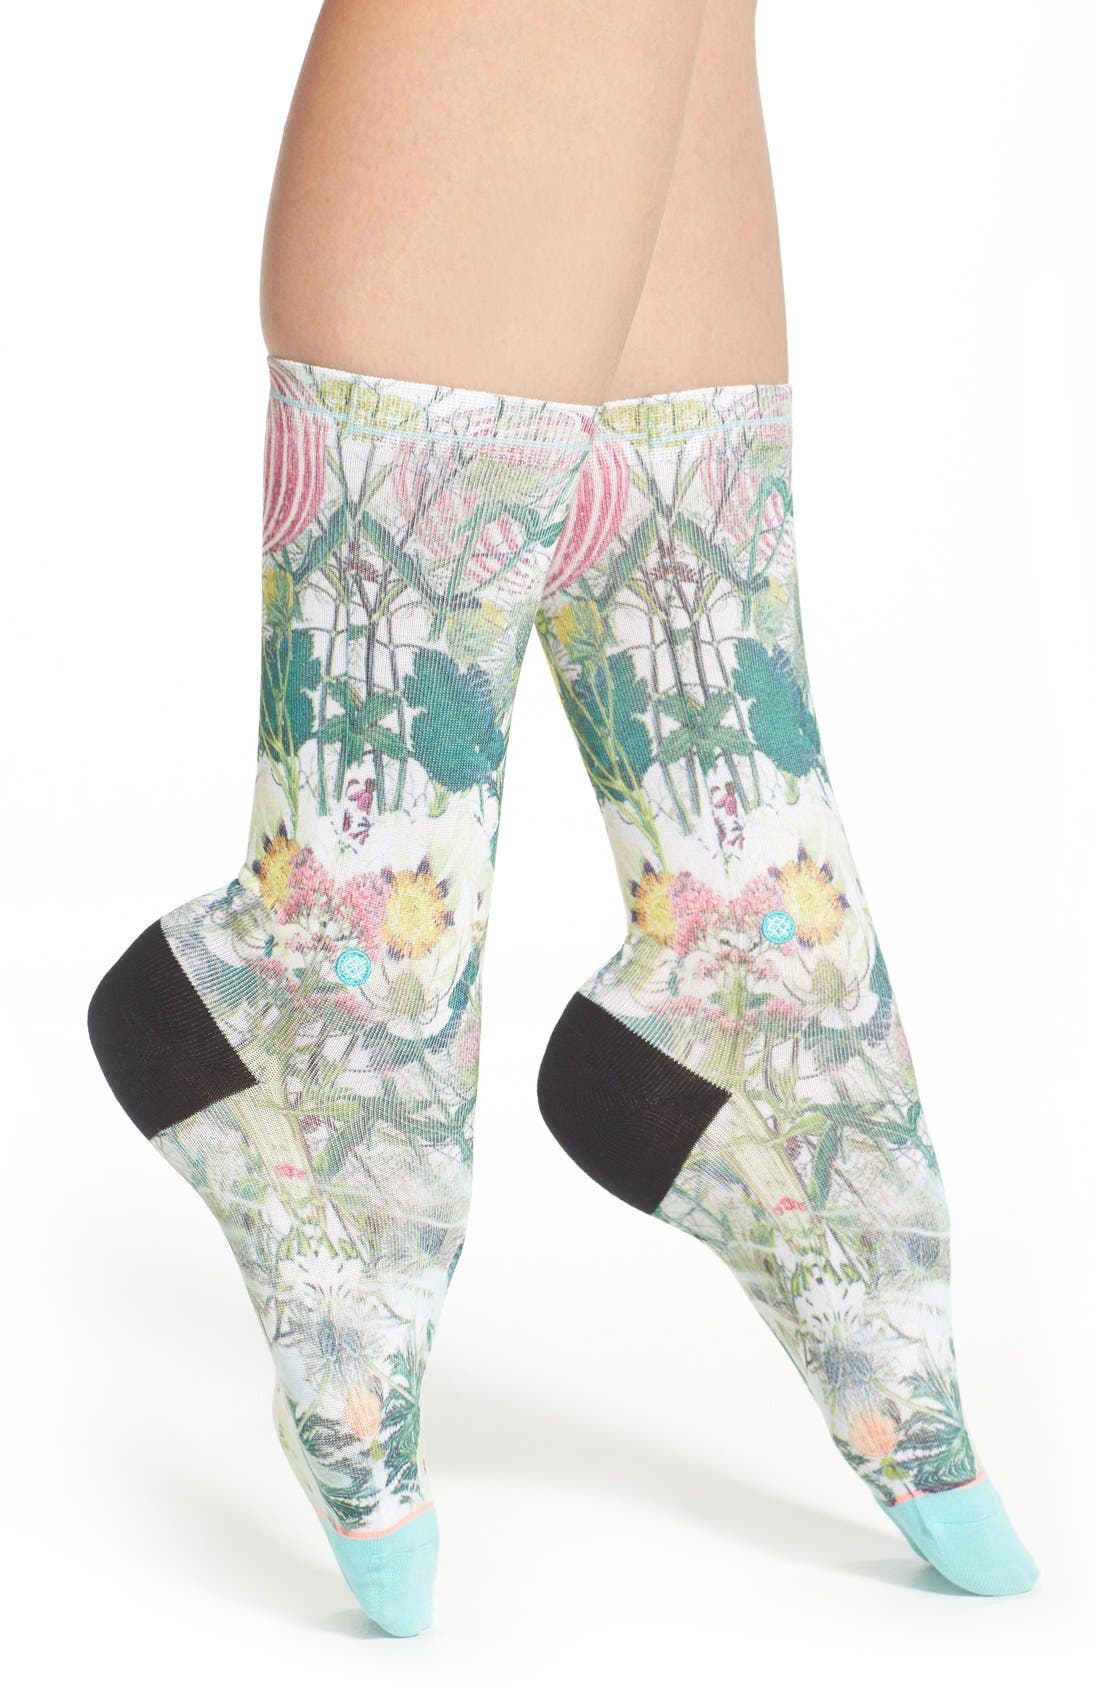 Main Image - Stance 'Chaotic Flower' Socks